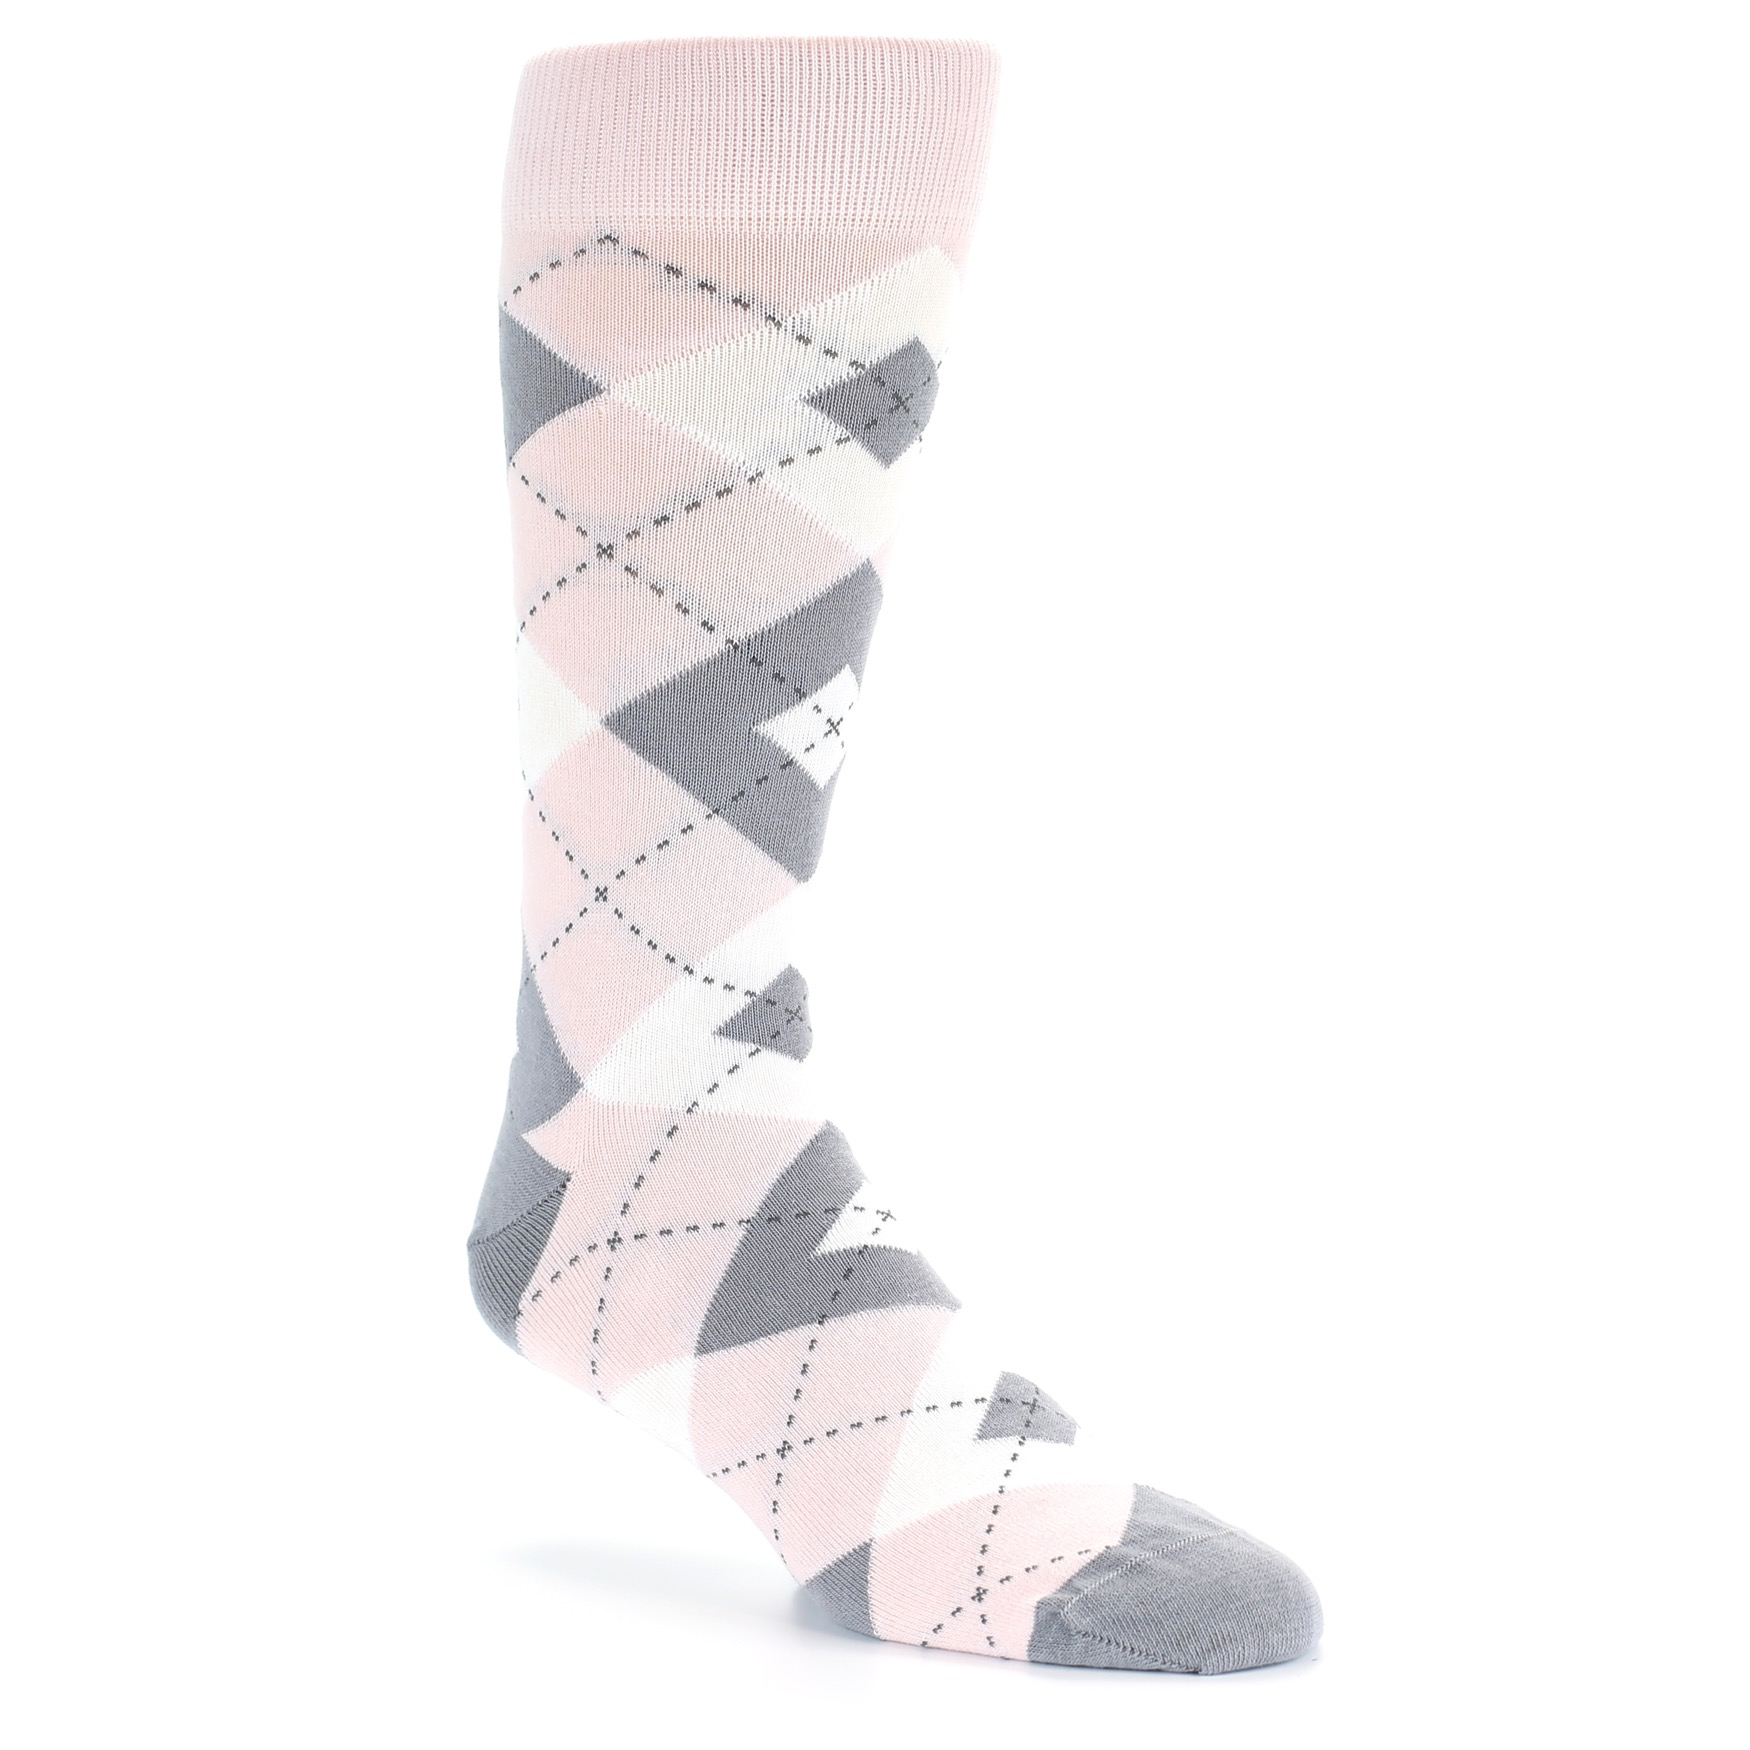 Petal Light Pink Gray Argyle Wedding Men's Dress Socks